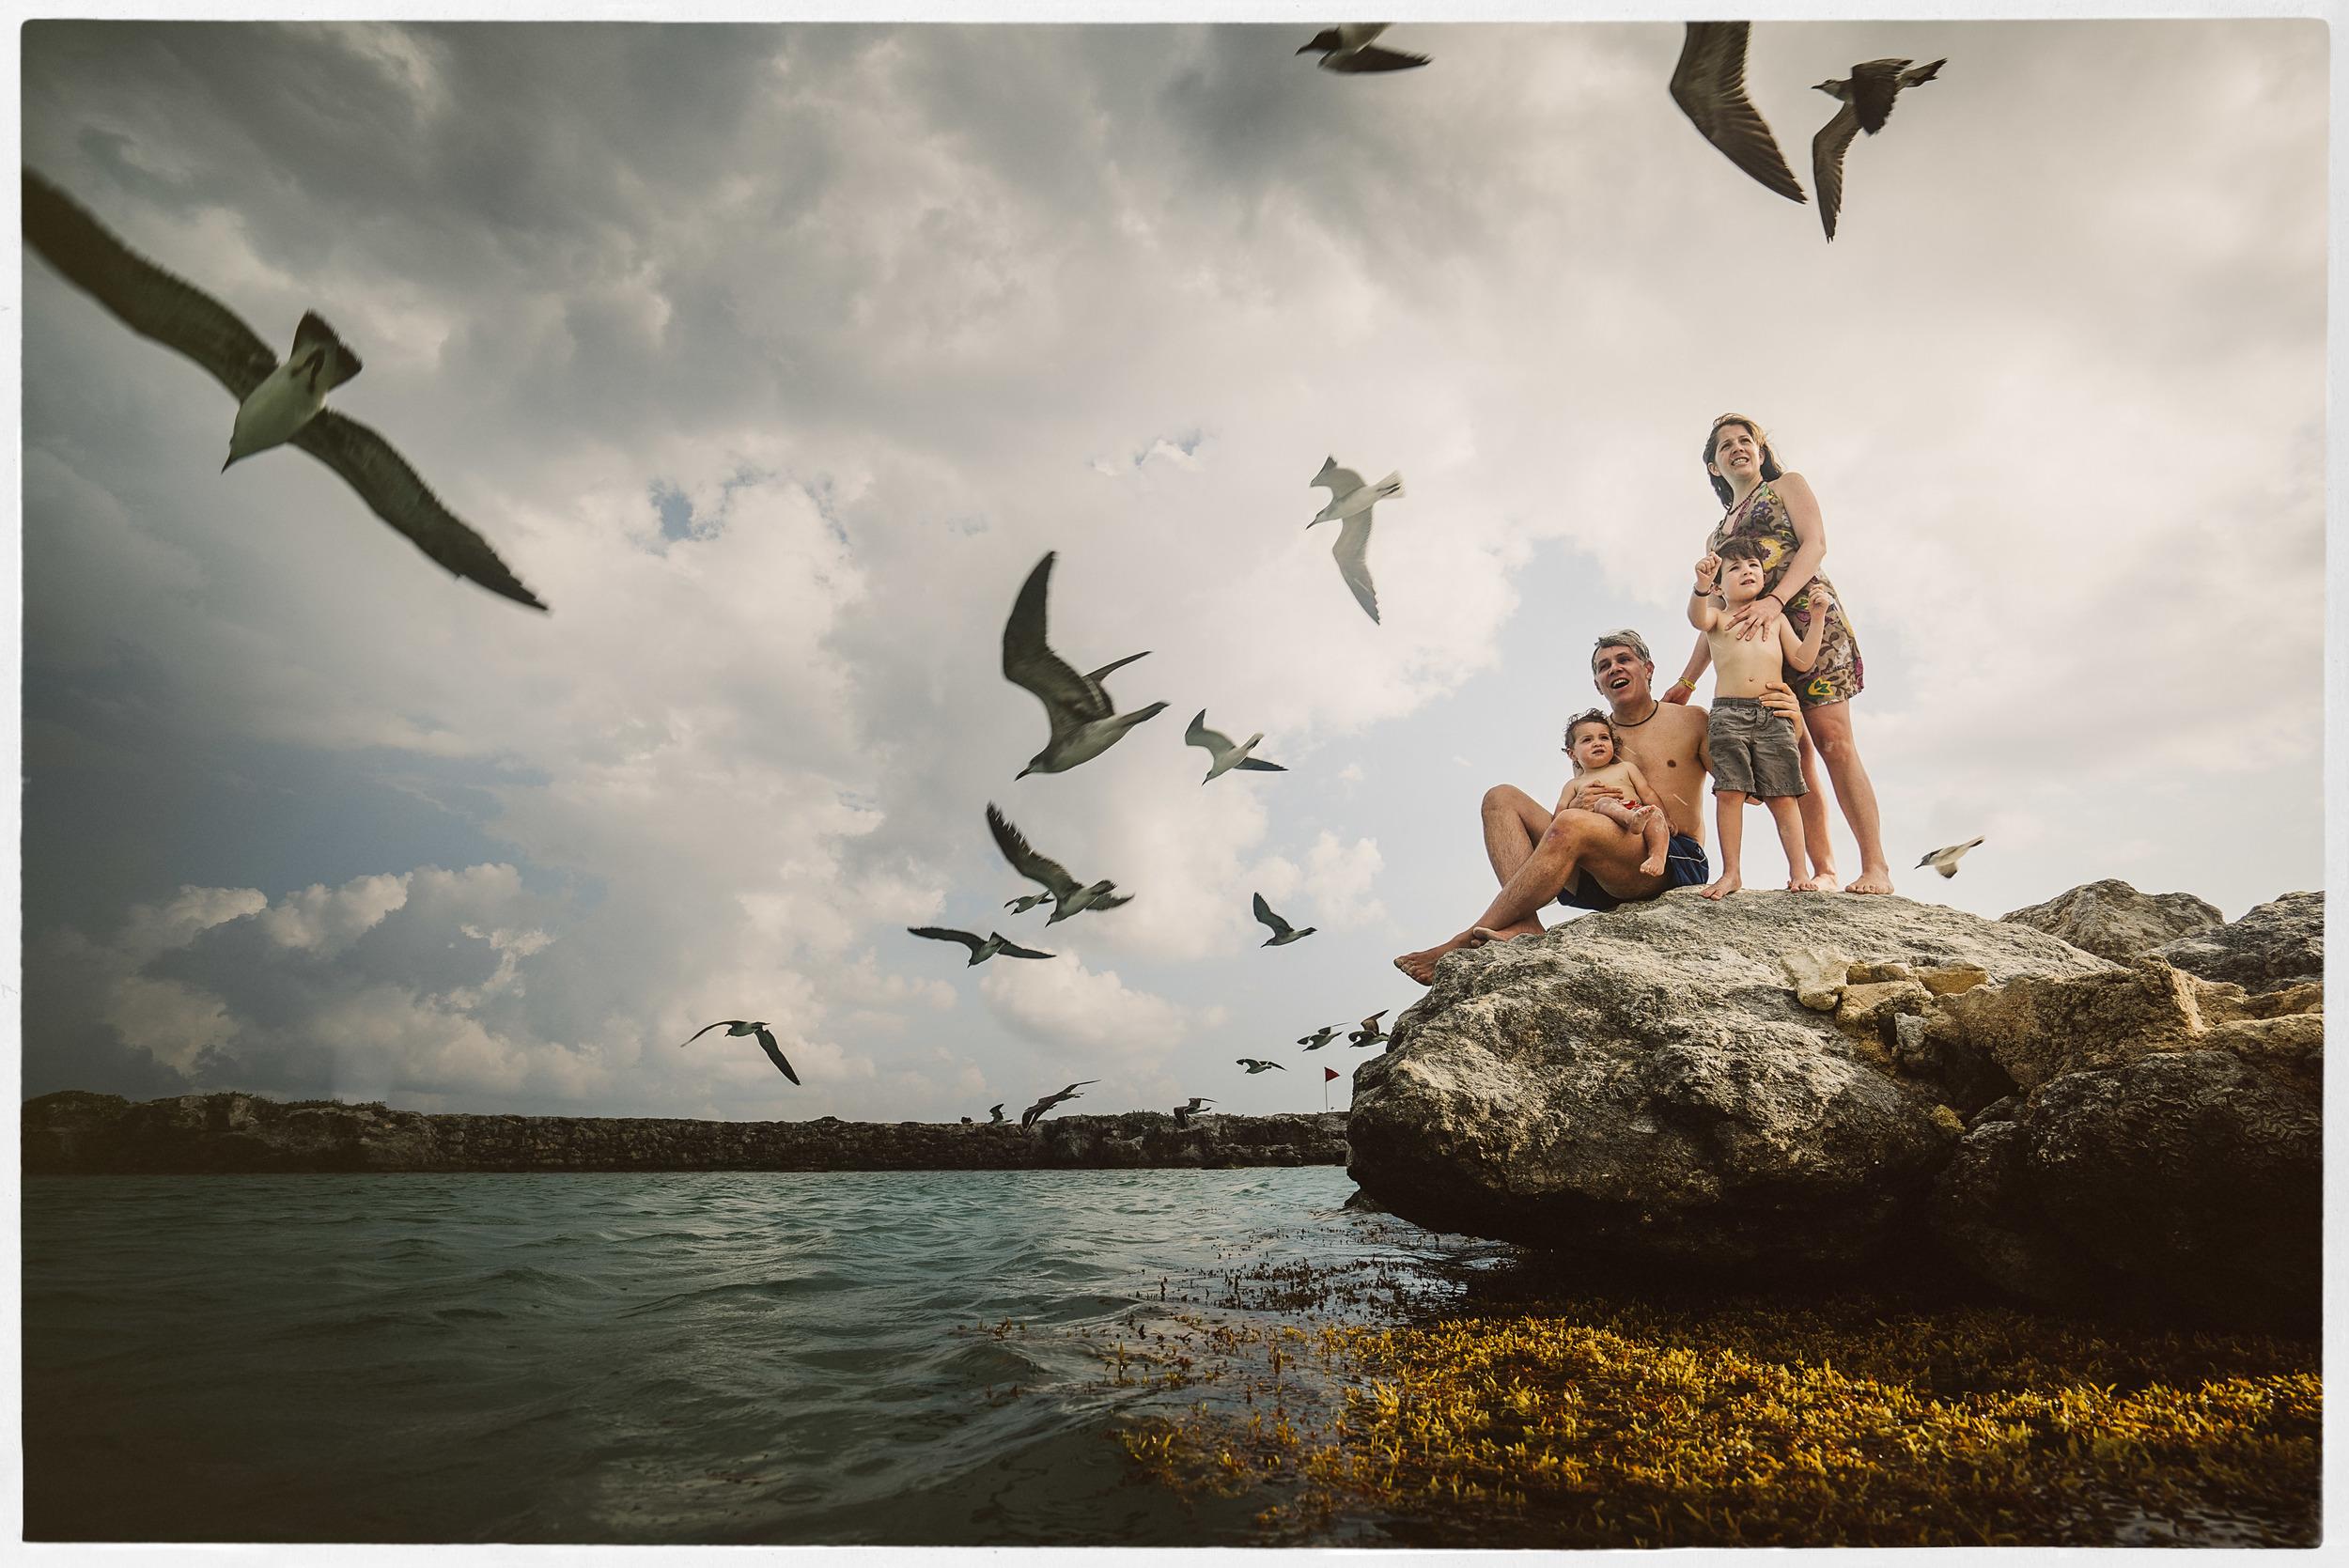 MaurizioSolisBroca.Photography20150314DSC05486-Edit-2-Edit.jpg